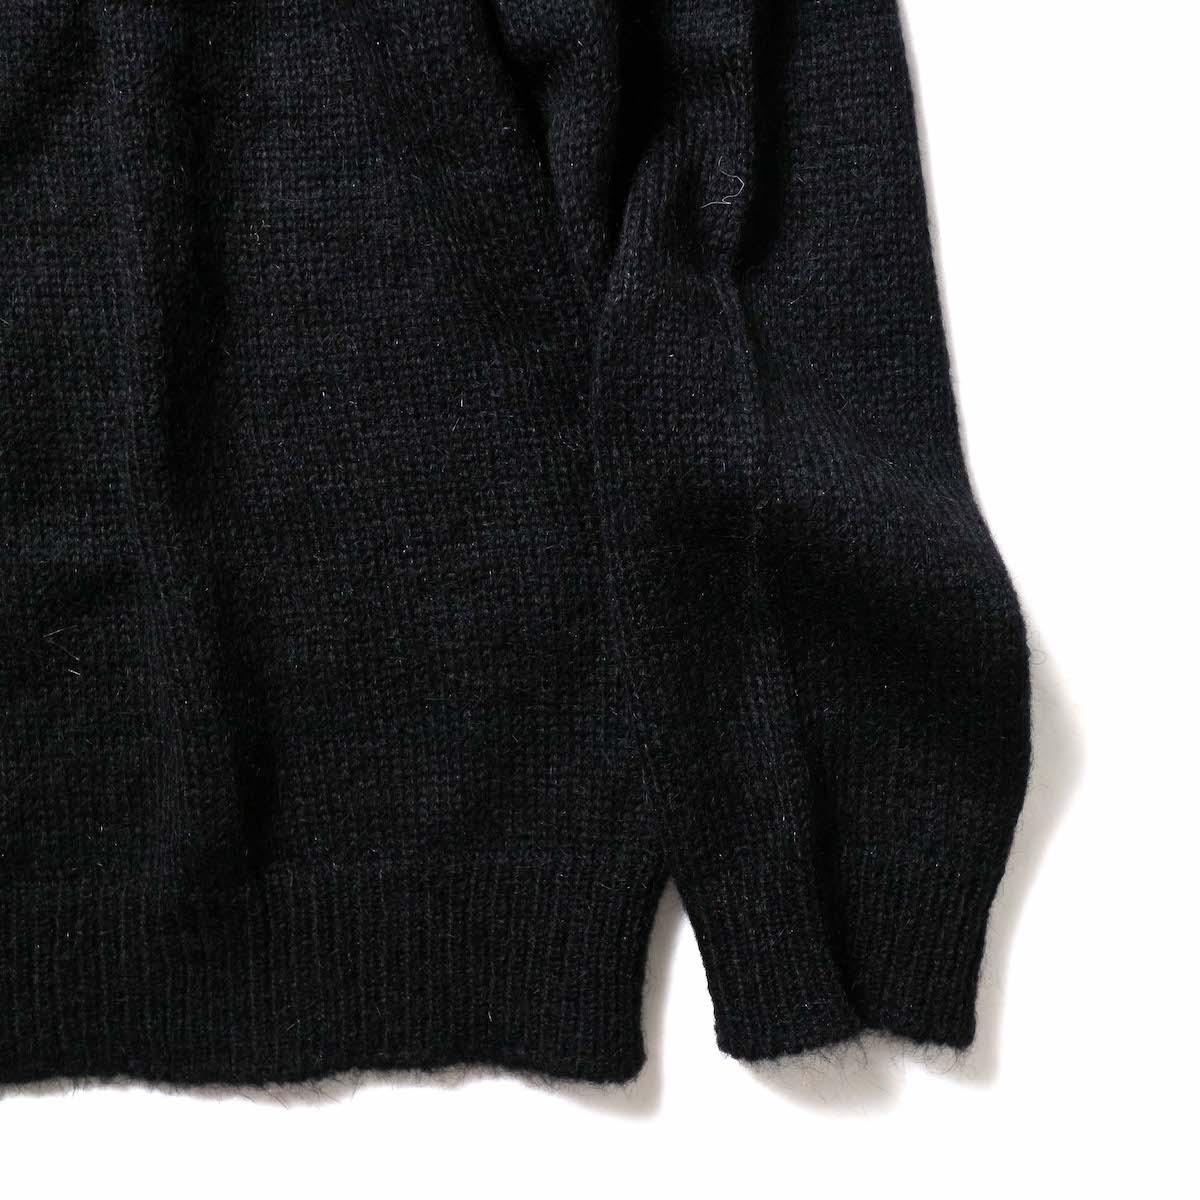 FLAMAND / Mohair Basic (Black)袖、裾